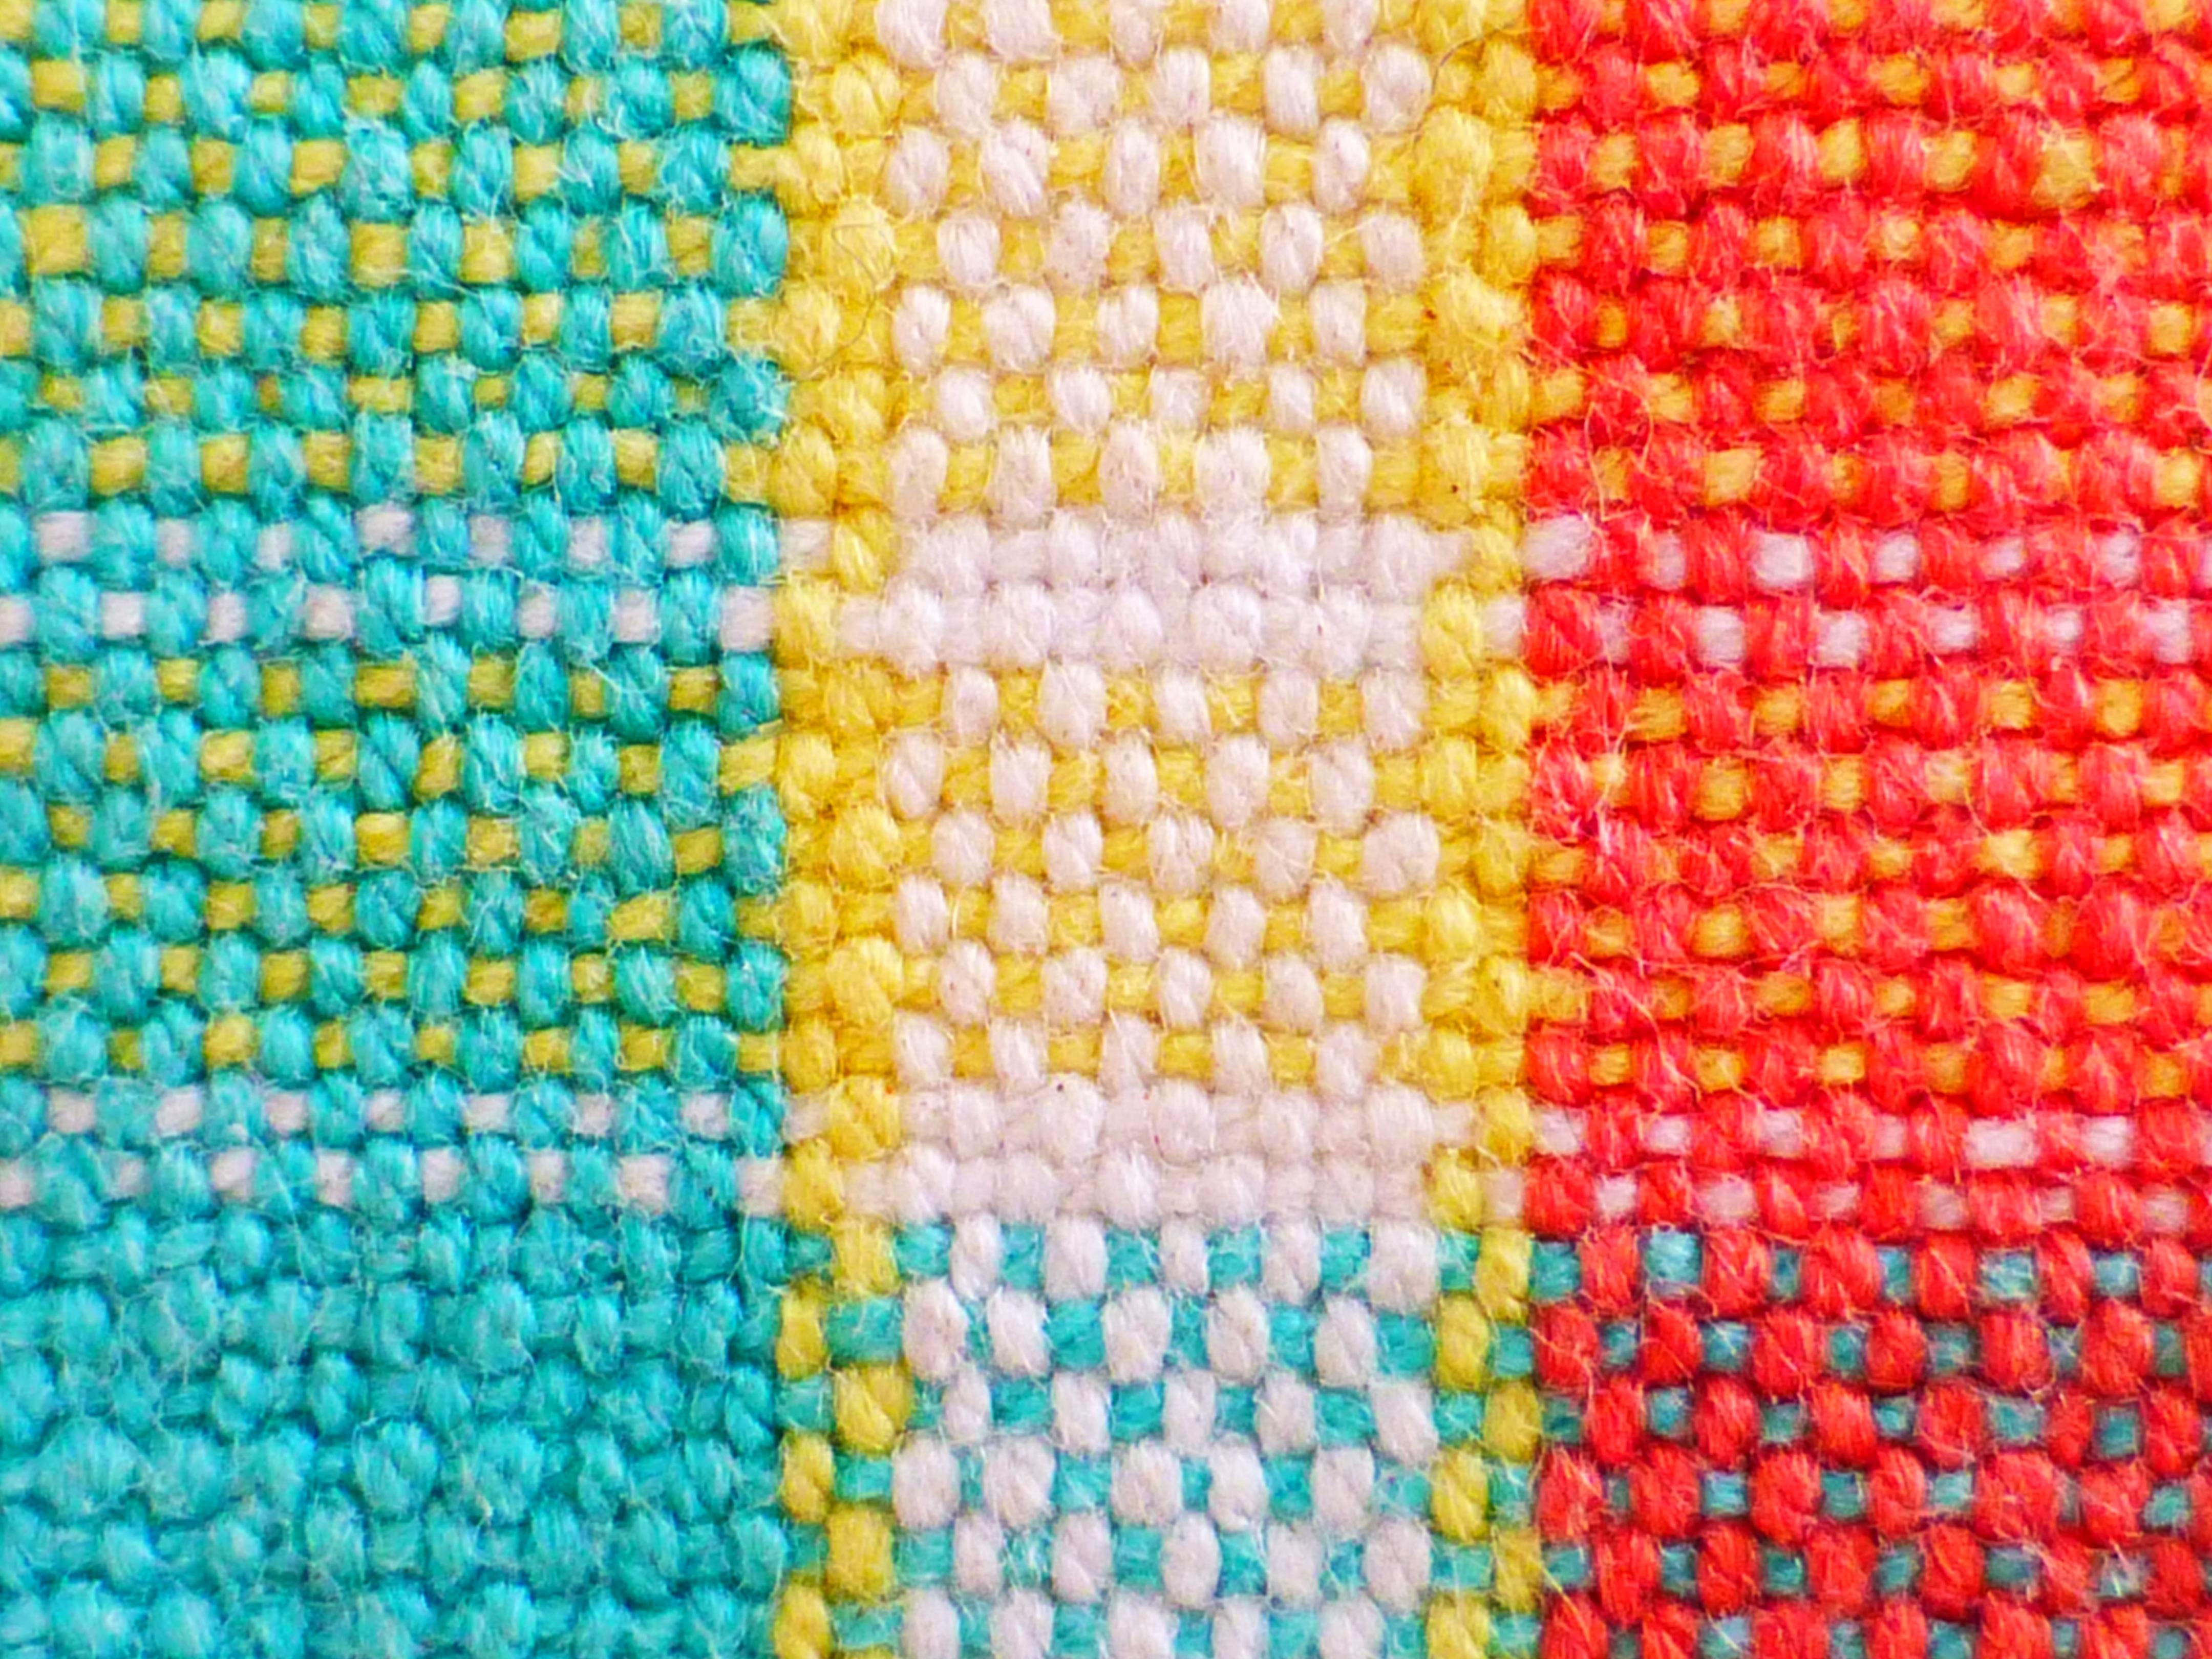 Kostenlose foto : Struktur, Muster, Farbe, bunt, Perle, Spielzeug ...